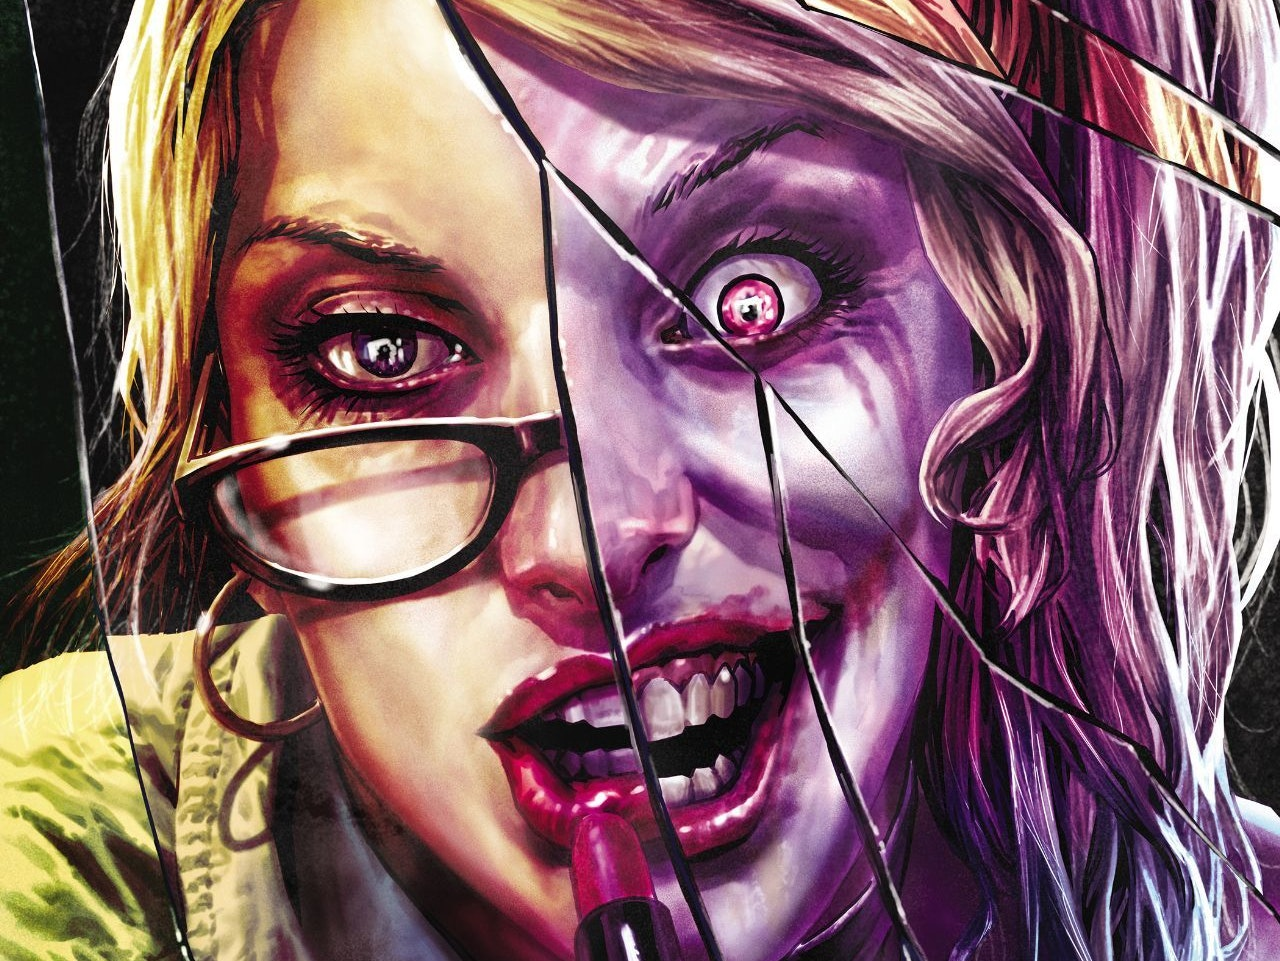 Harley Quinn's Next Wacko Stunt Will Restore Her Sanity